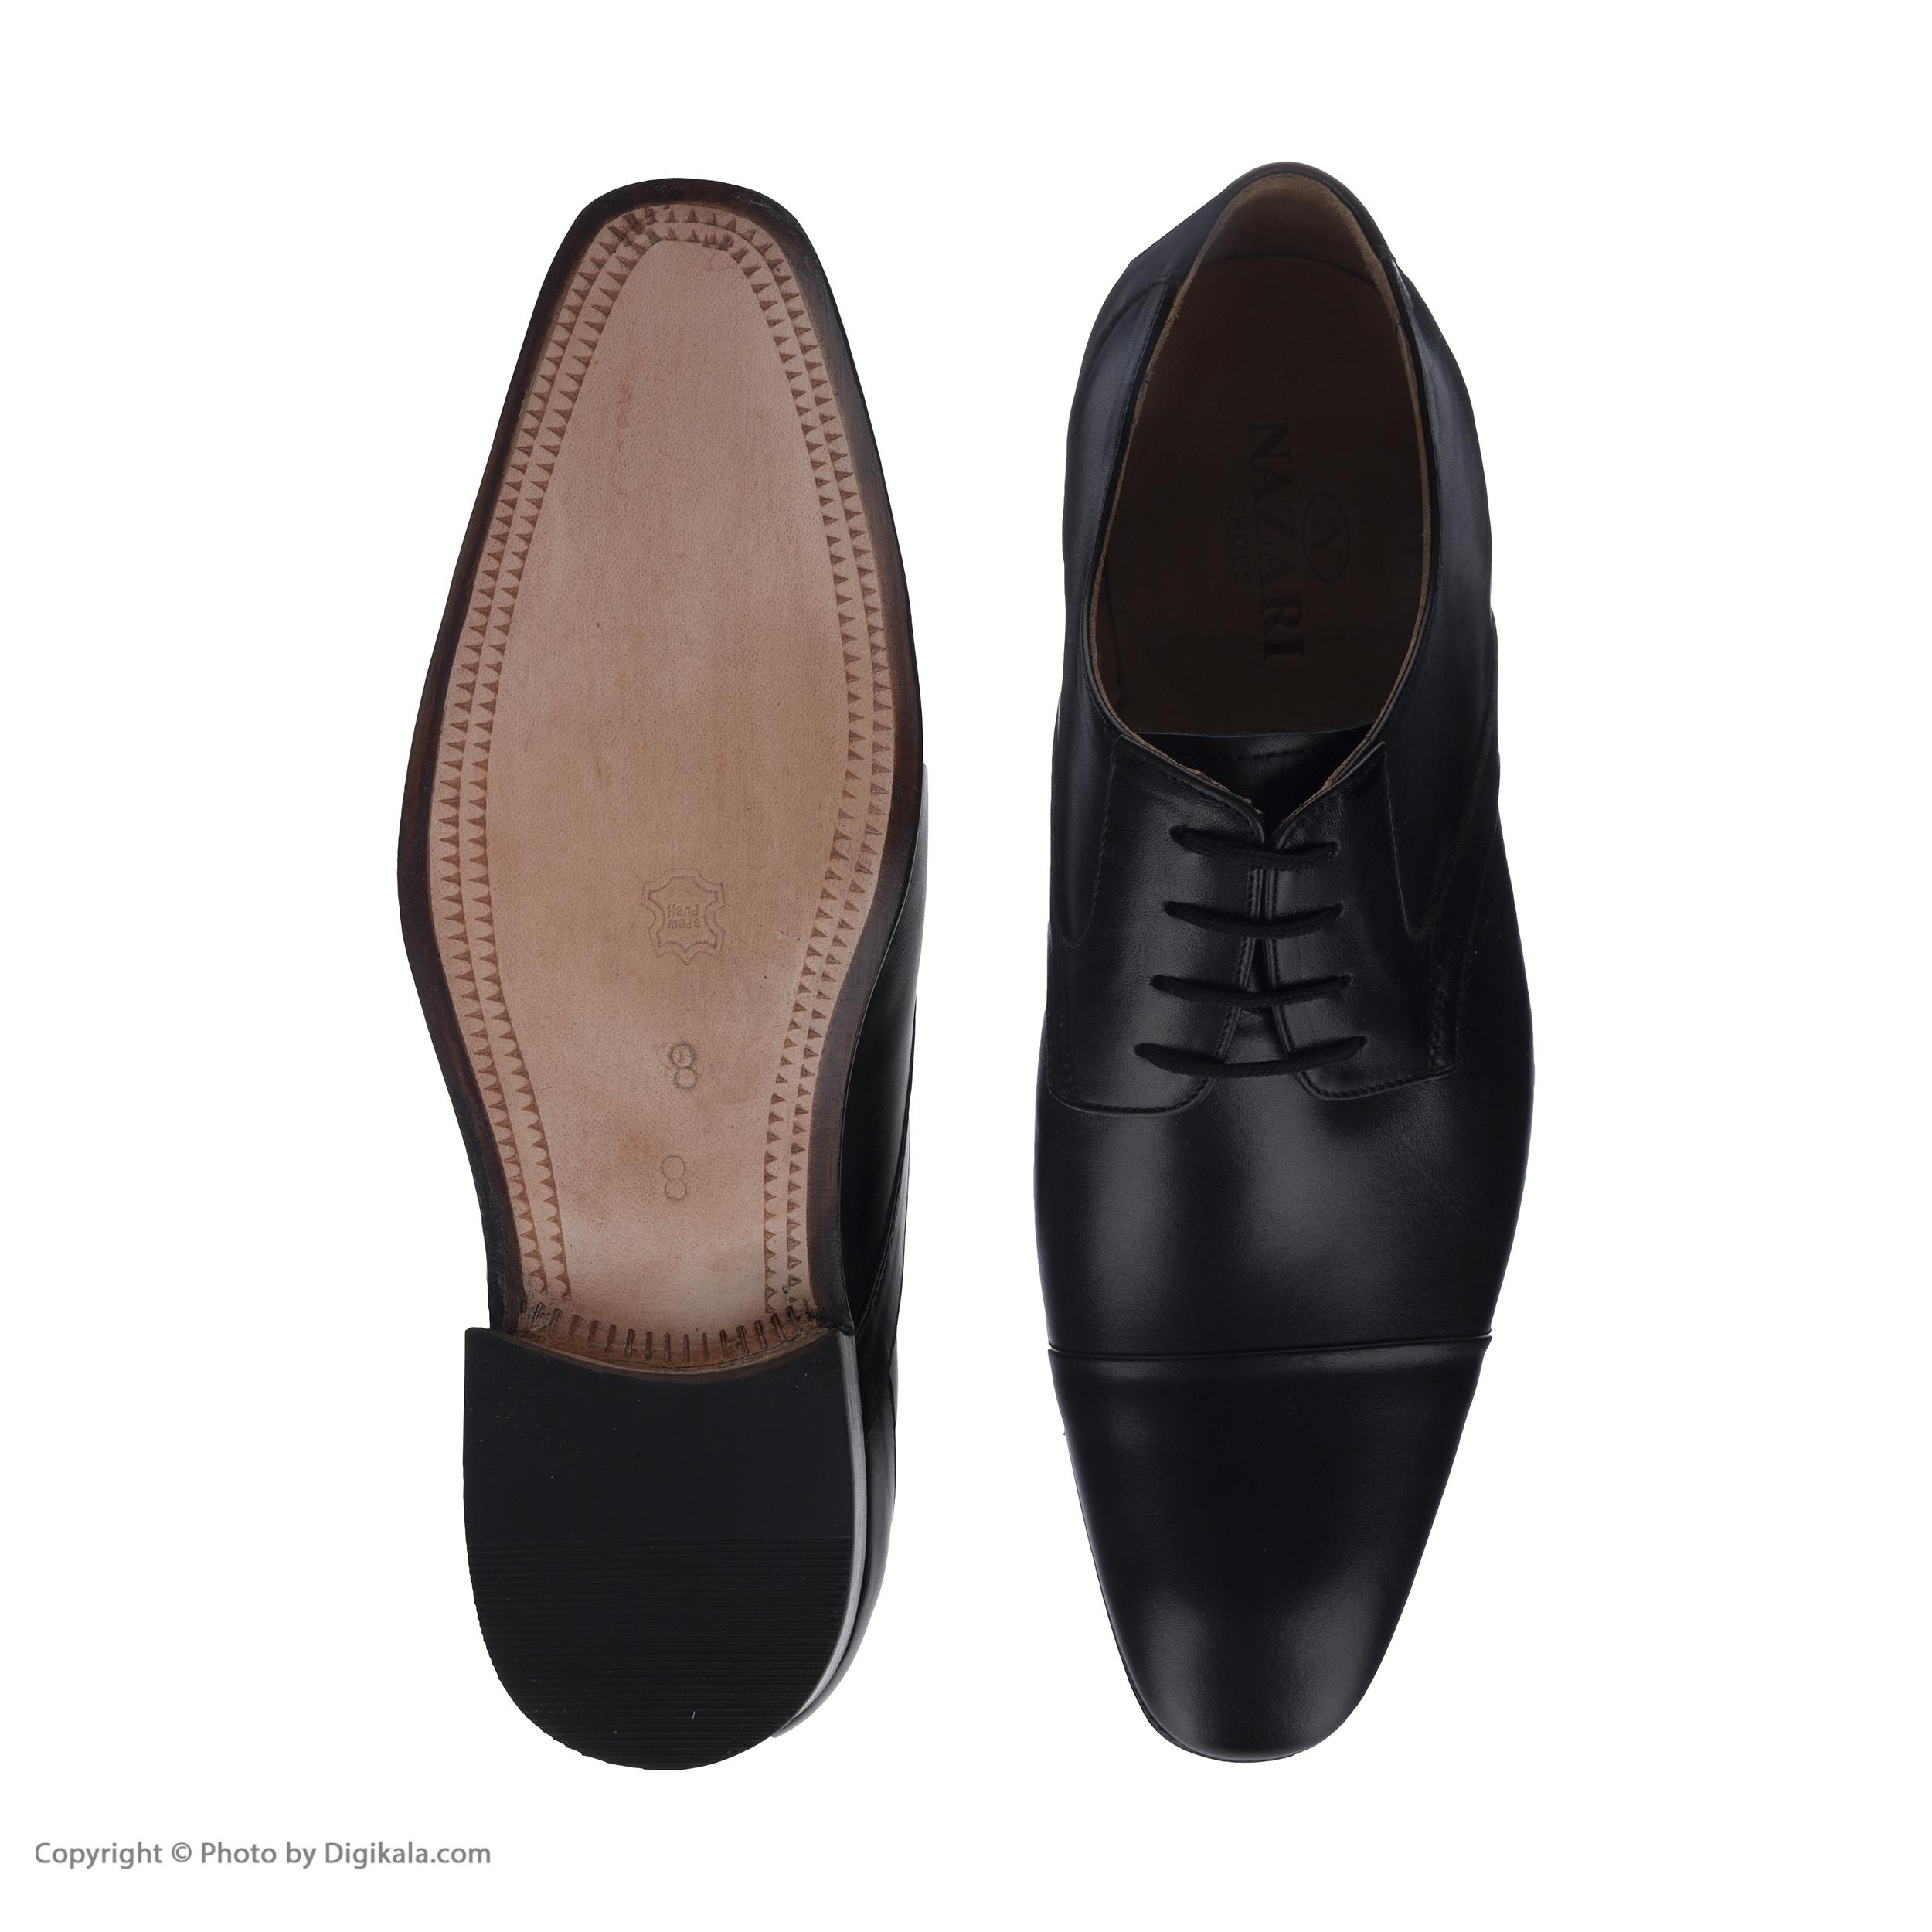 کفش مردانه نظری کد 413 -  - 3